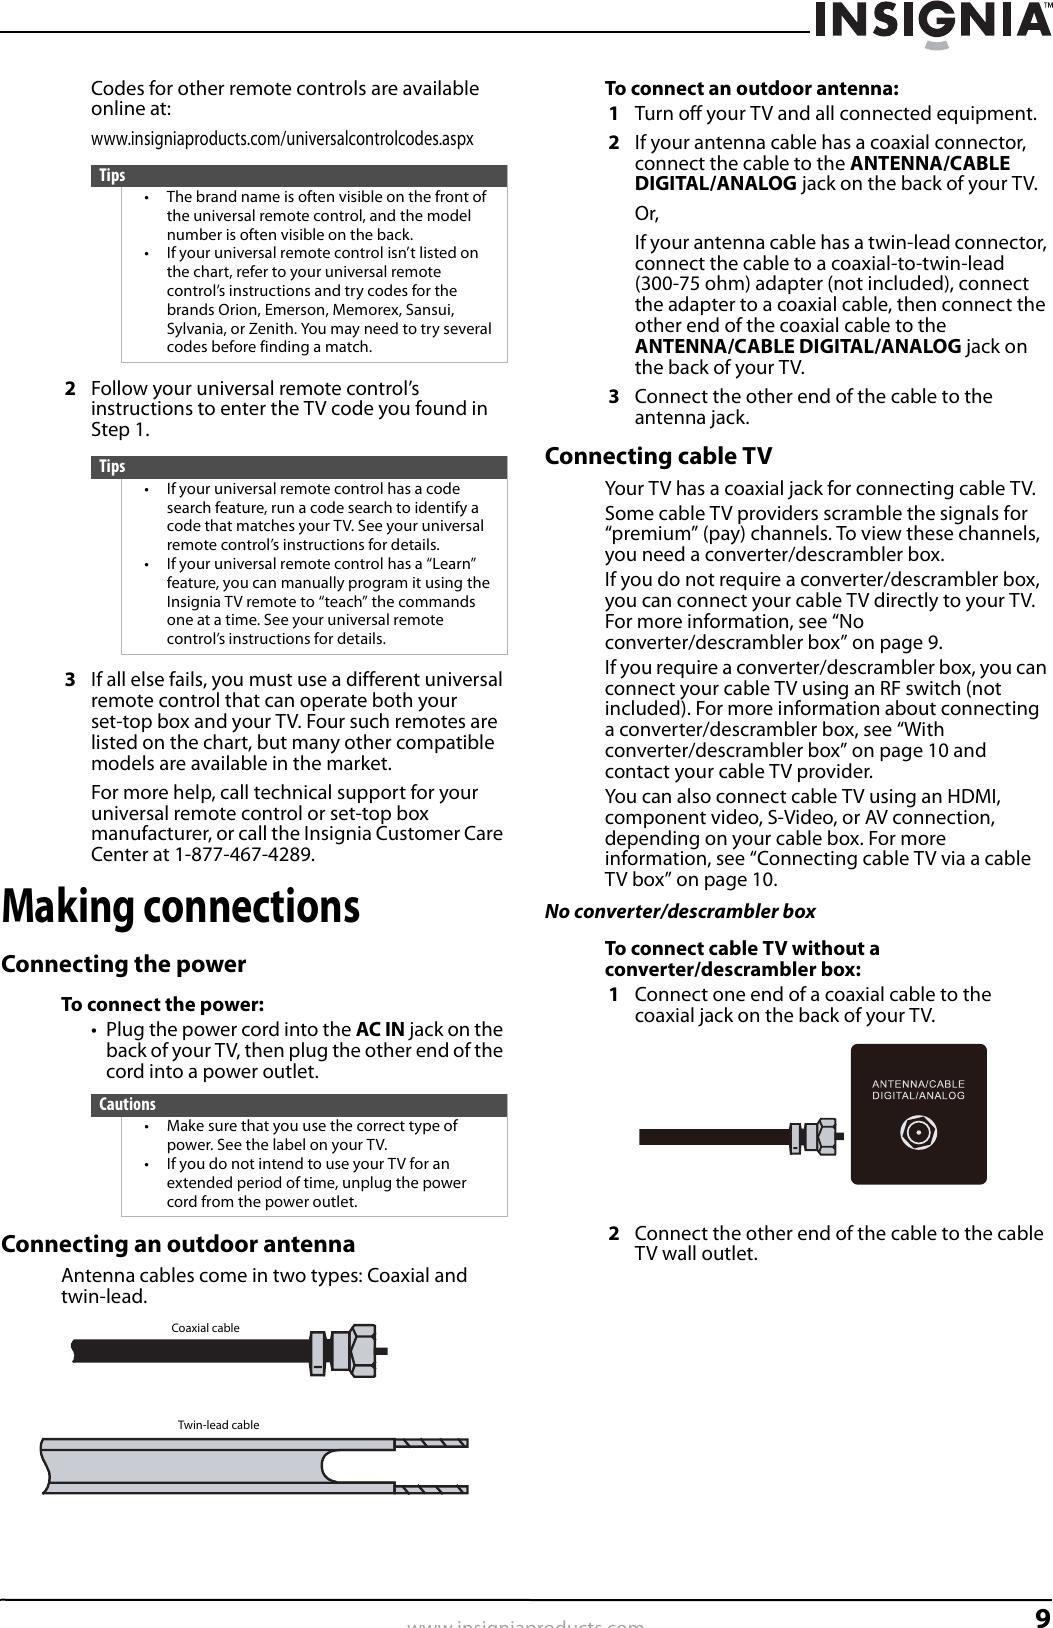 Insignia Ns L55X 10A Users Manual